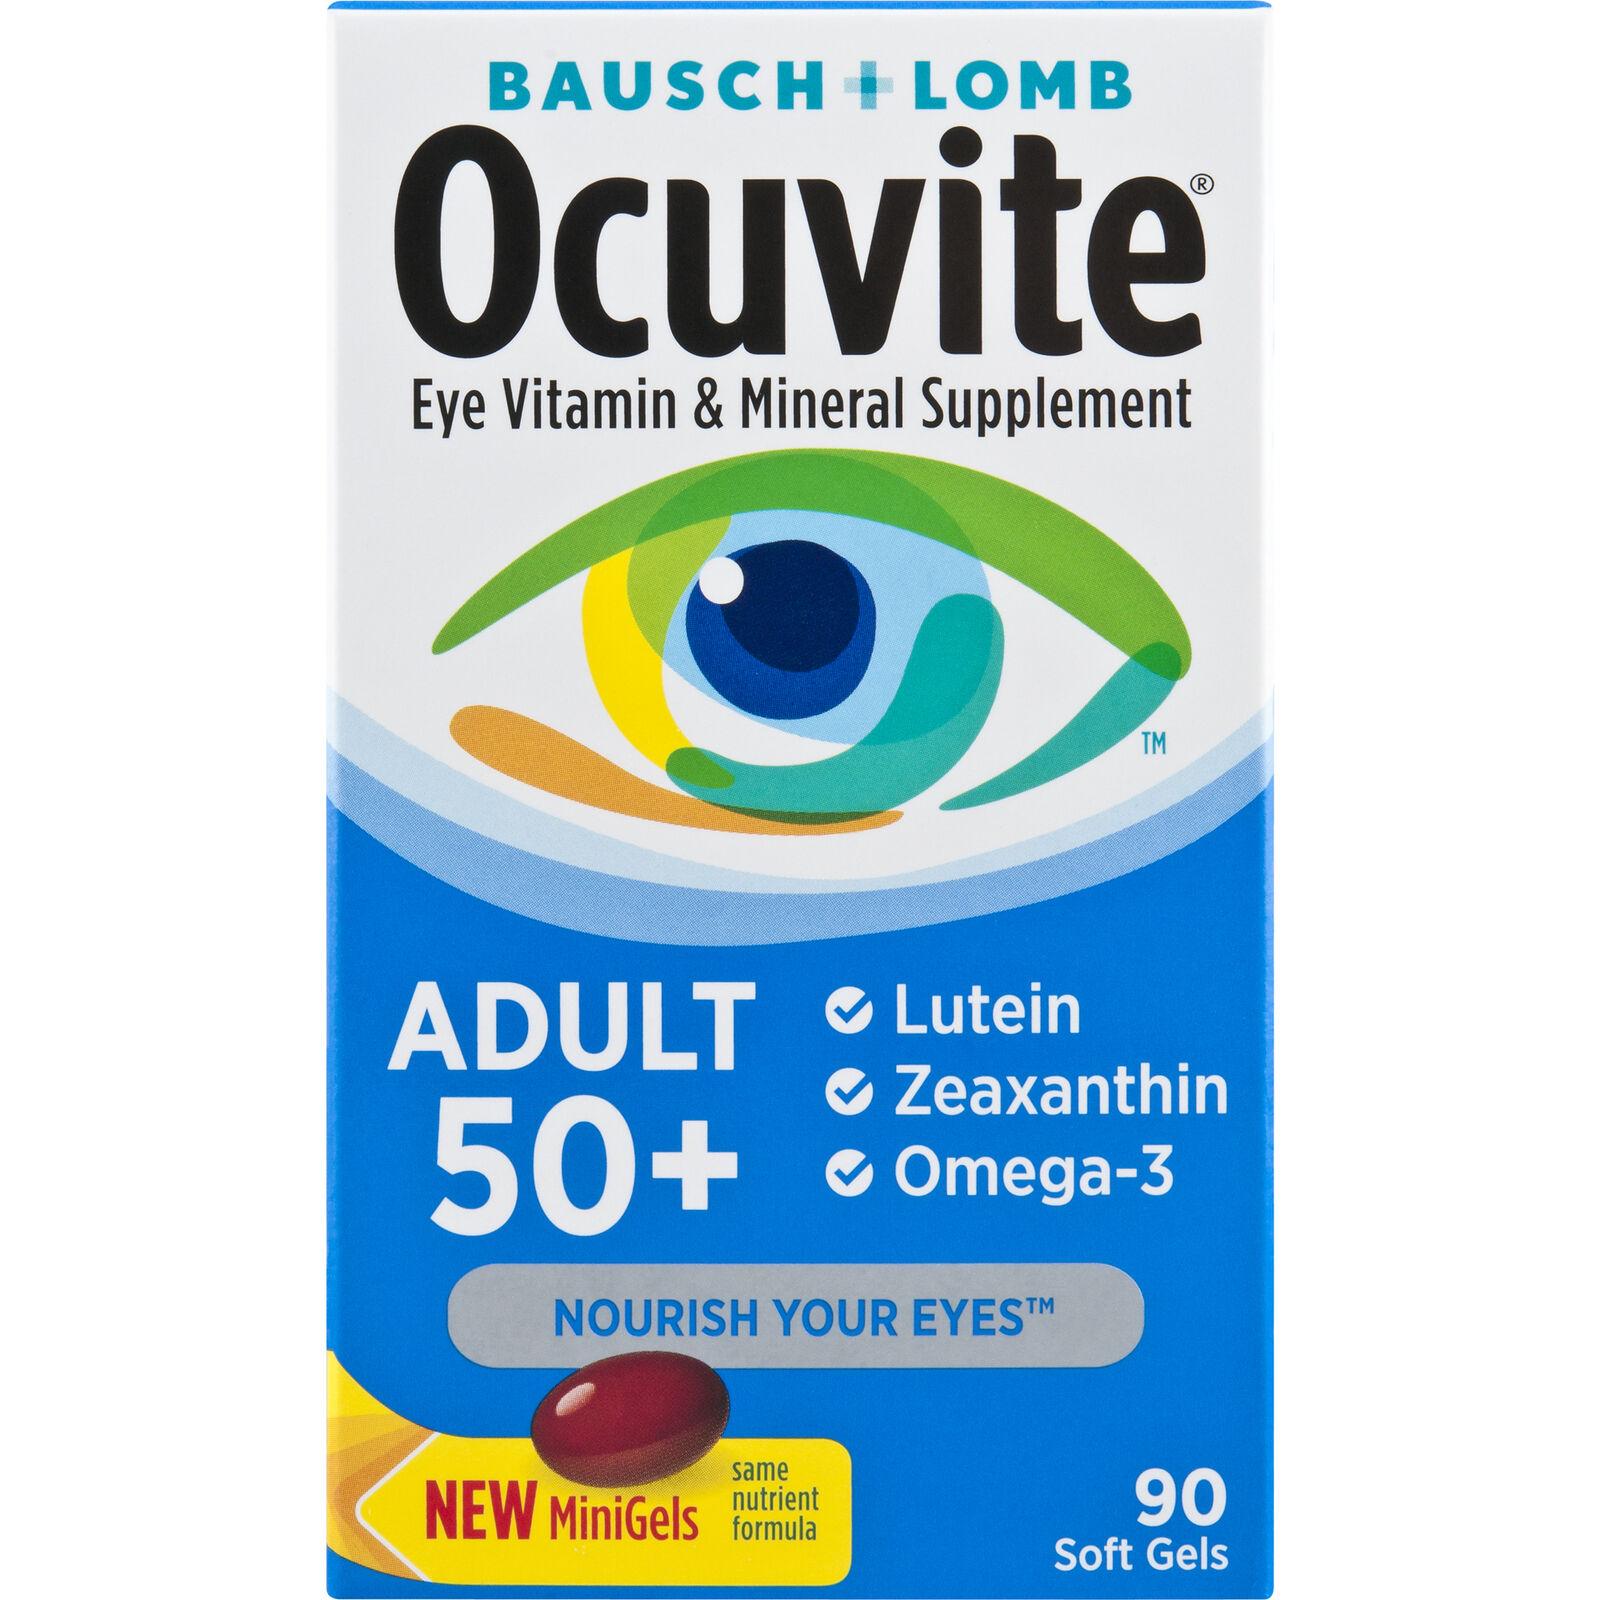 Bausch Lomb  Ocuvite 50+ Adult Eye Vitamin 90 Mini Gels NEW-